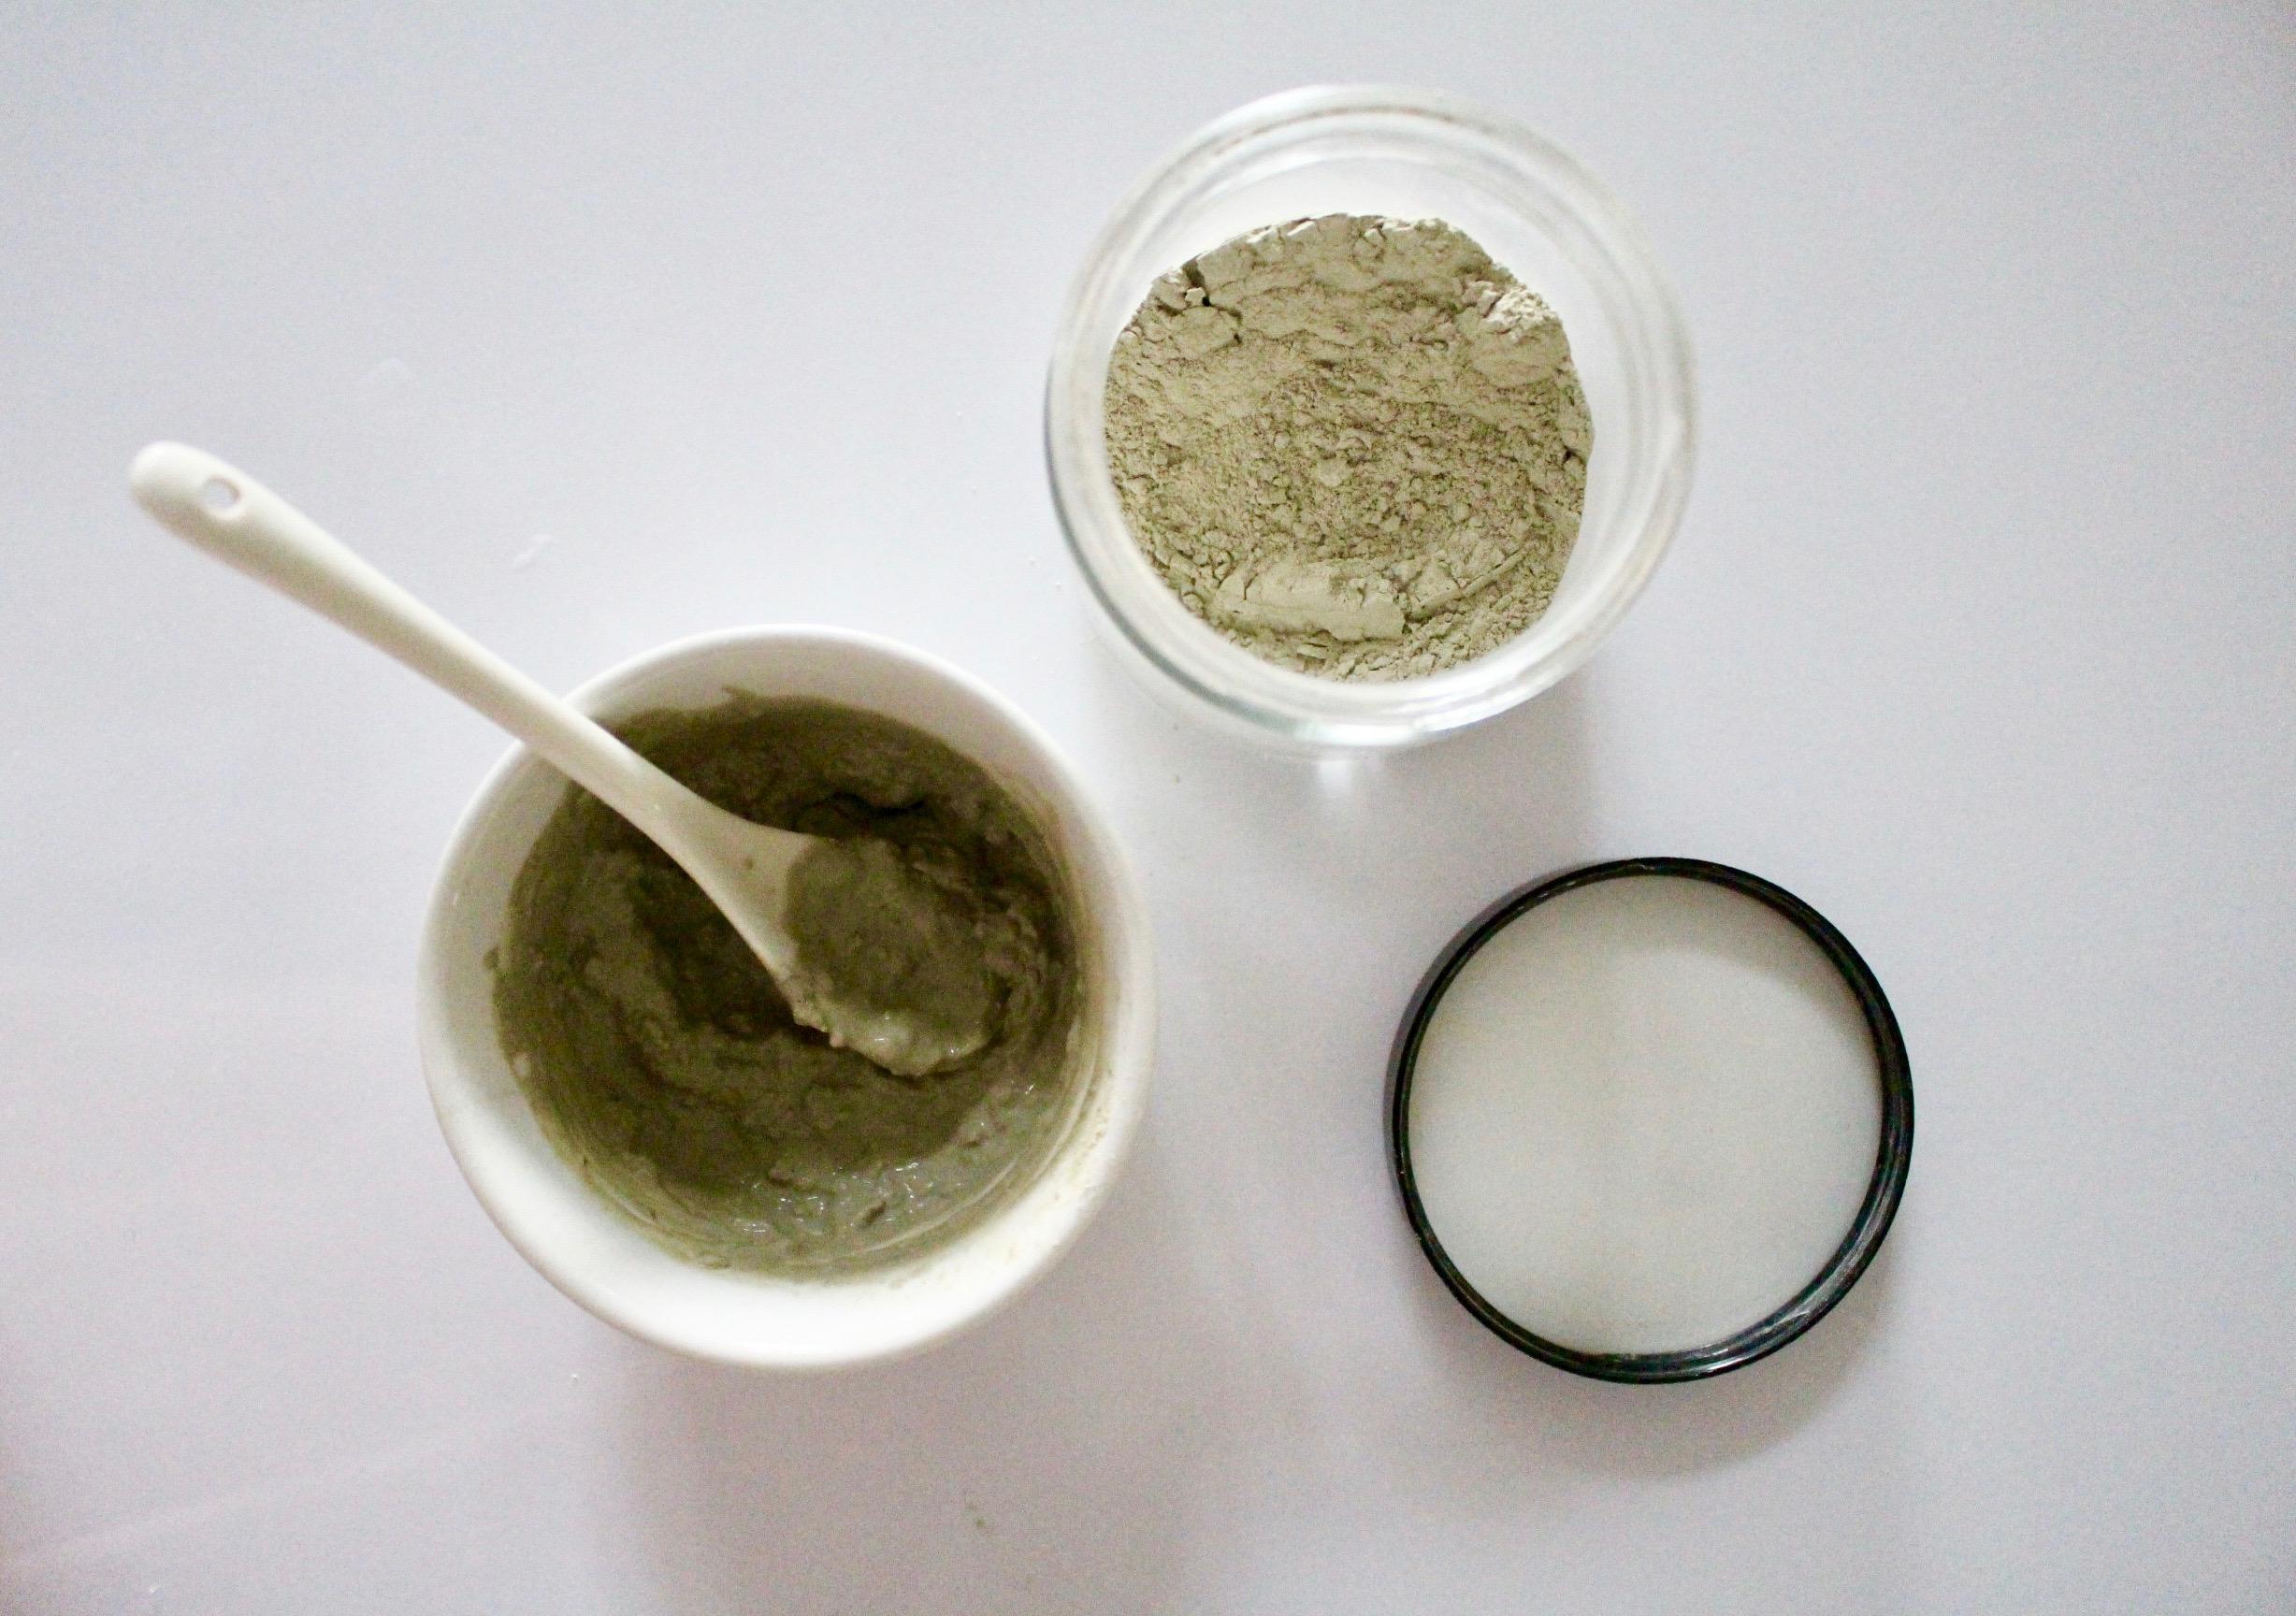 DIY CLAY MASKS / BEAUTY / GREEN BEAUTY / NATURAL BEAUTY / AZTEC SECRET HEALING CLAY / HONEY / MUD MASK / NICOLEMCARUSO.COM